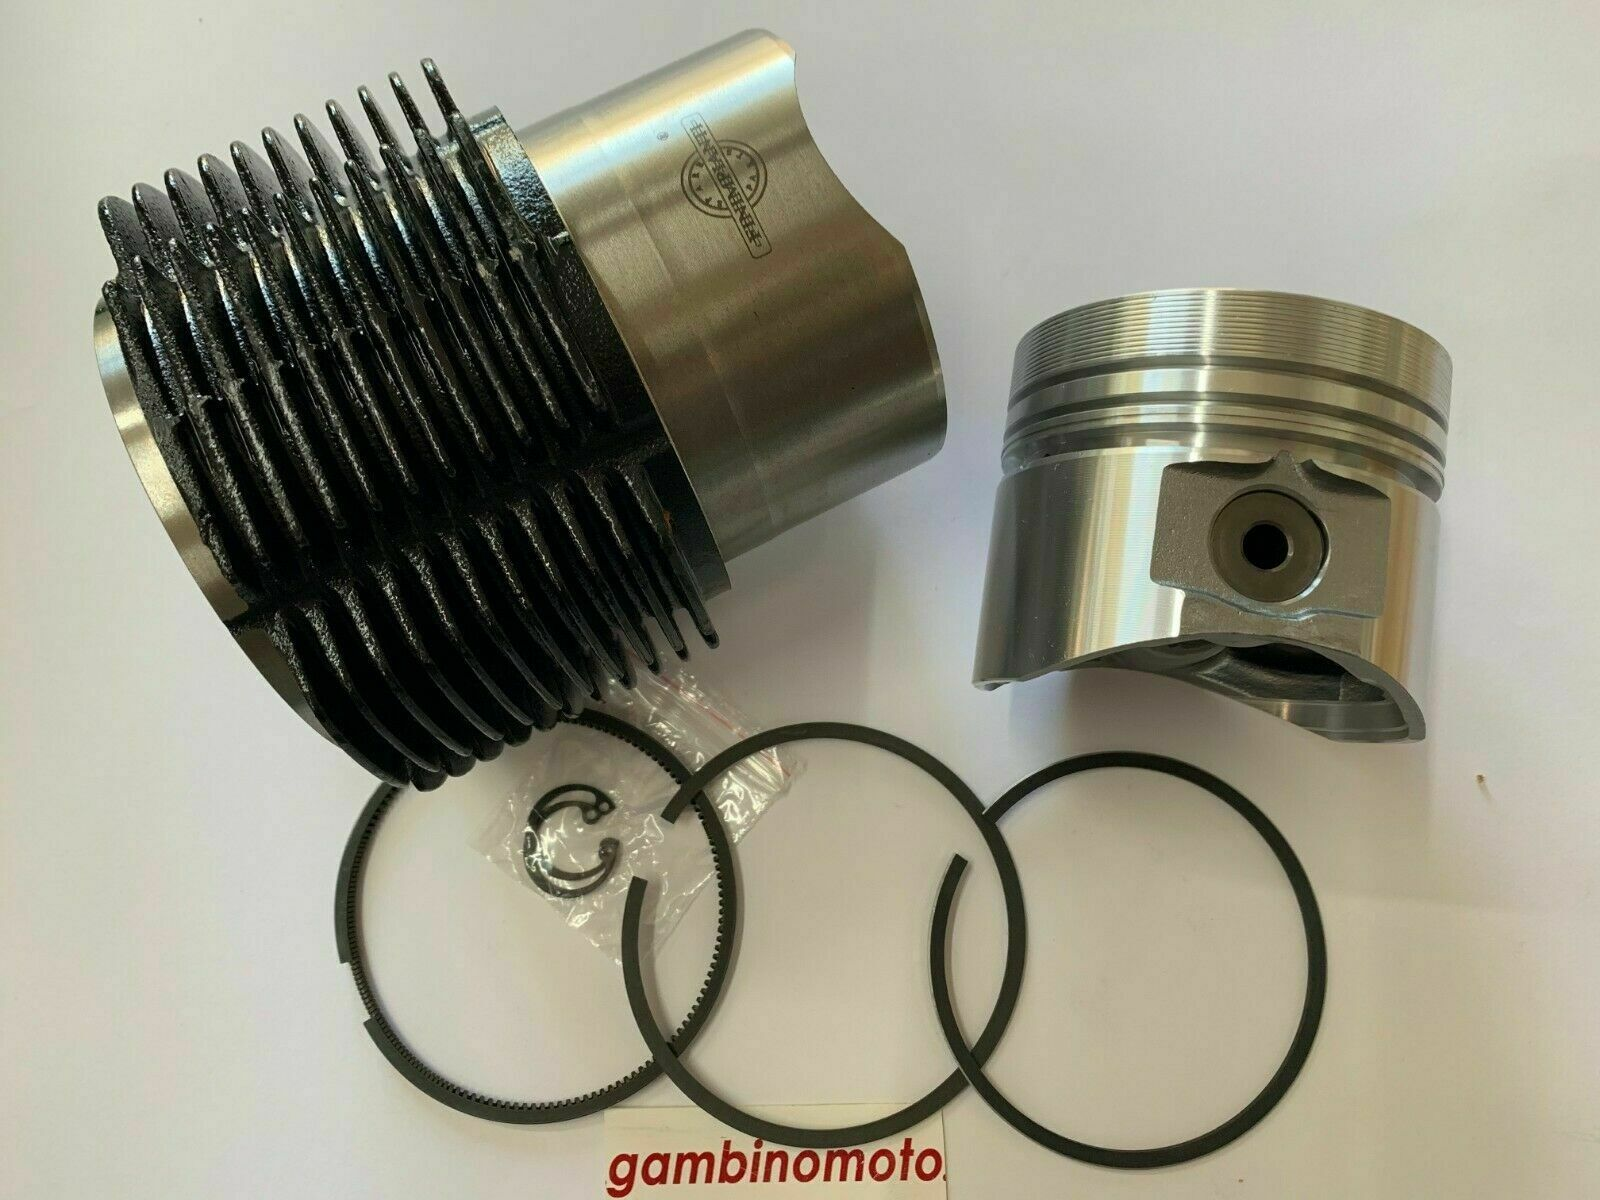 Cilindro Completo de Pistón para Motor Lombardini 6LD360-6LD360   C - 6LD360V